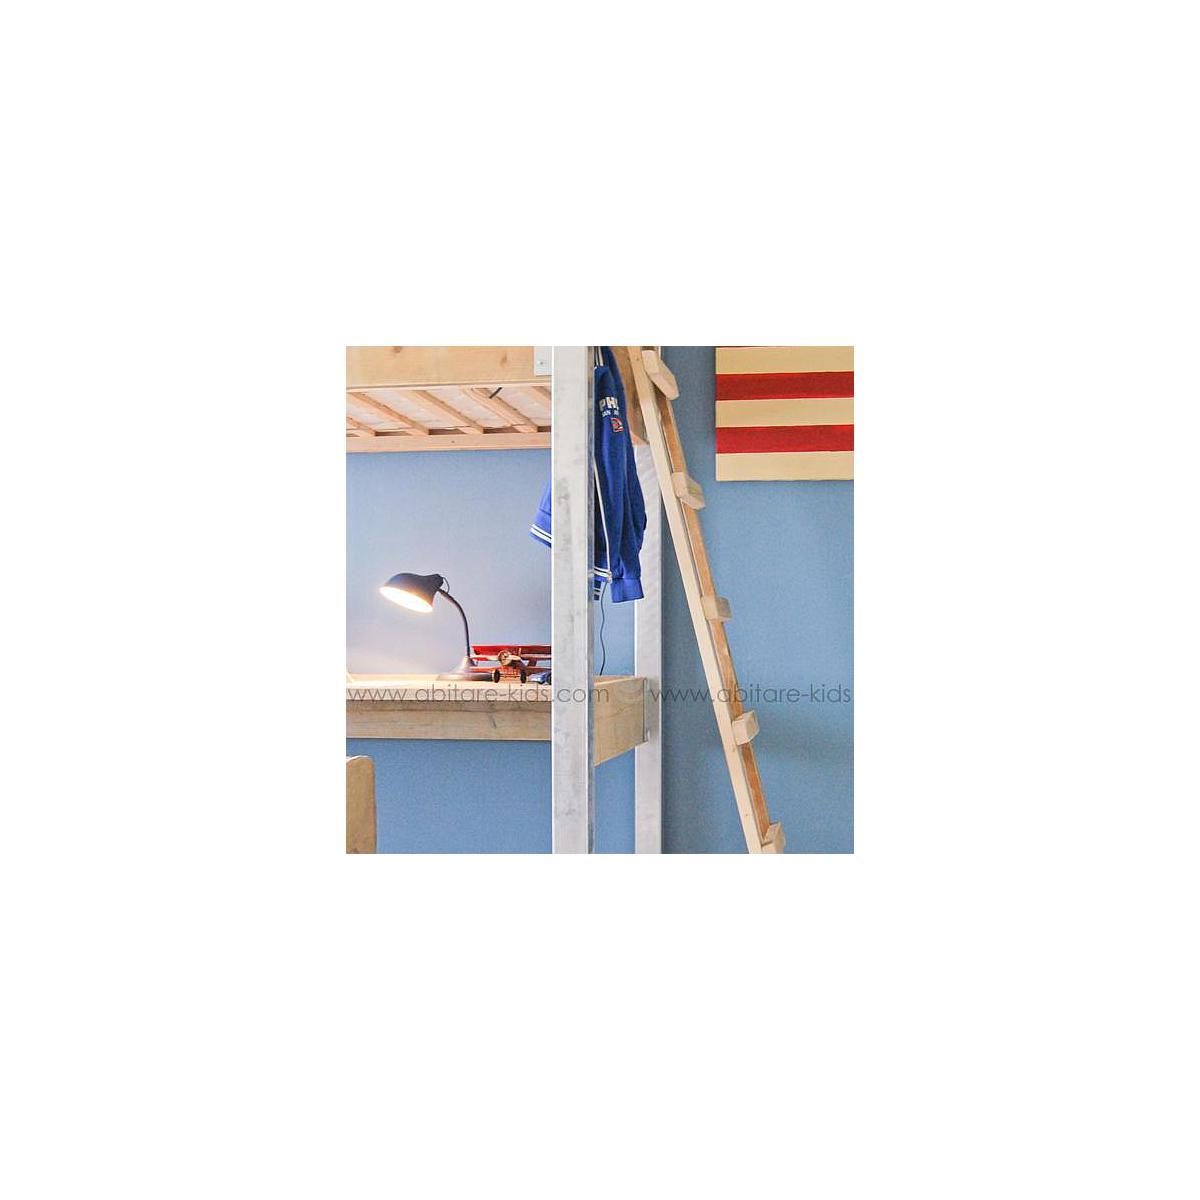 Lit mezzanine-bureau 90x200cm INDUSTRIEL Dutchwood